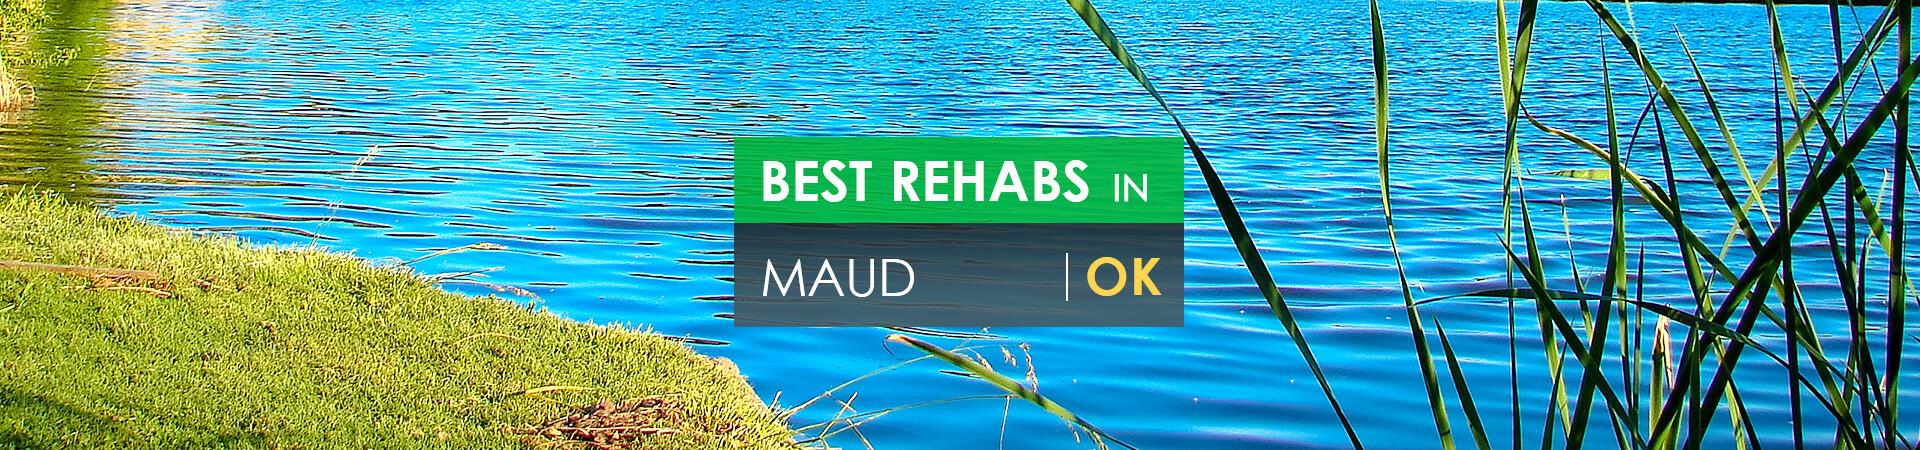 Best rehabs in Maud, OK